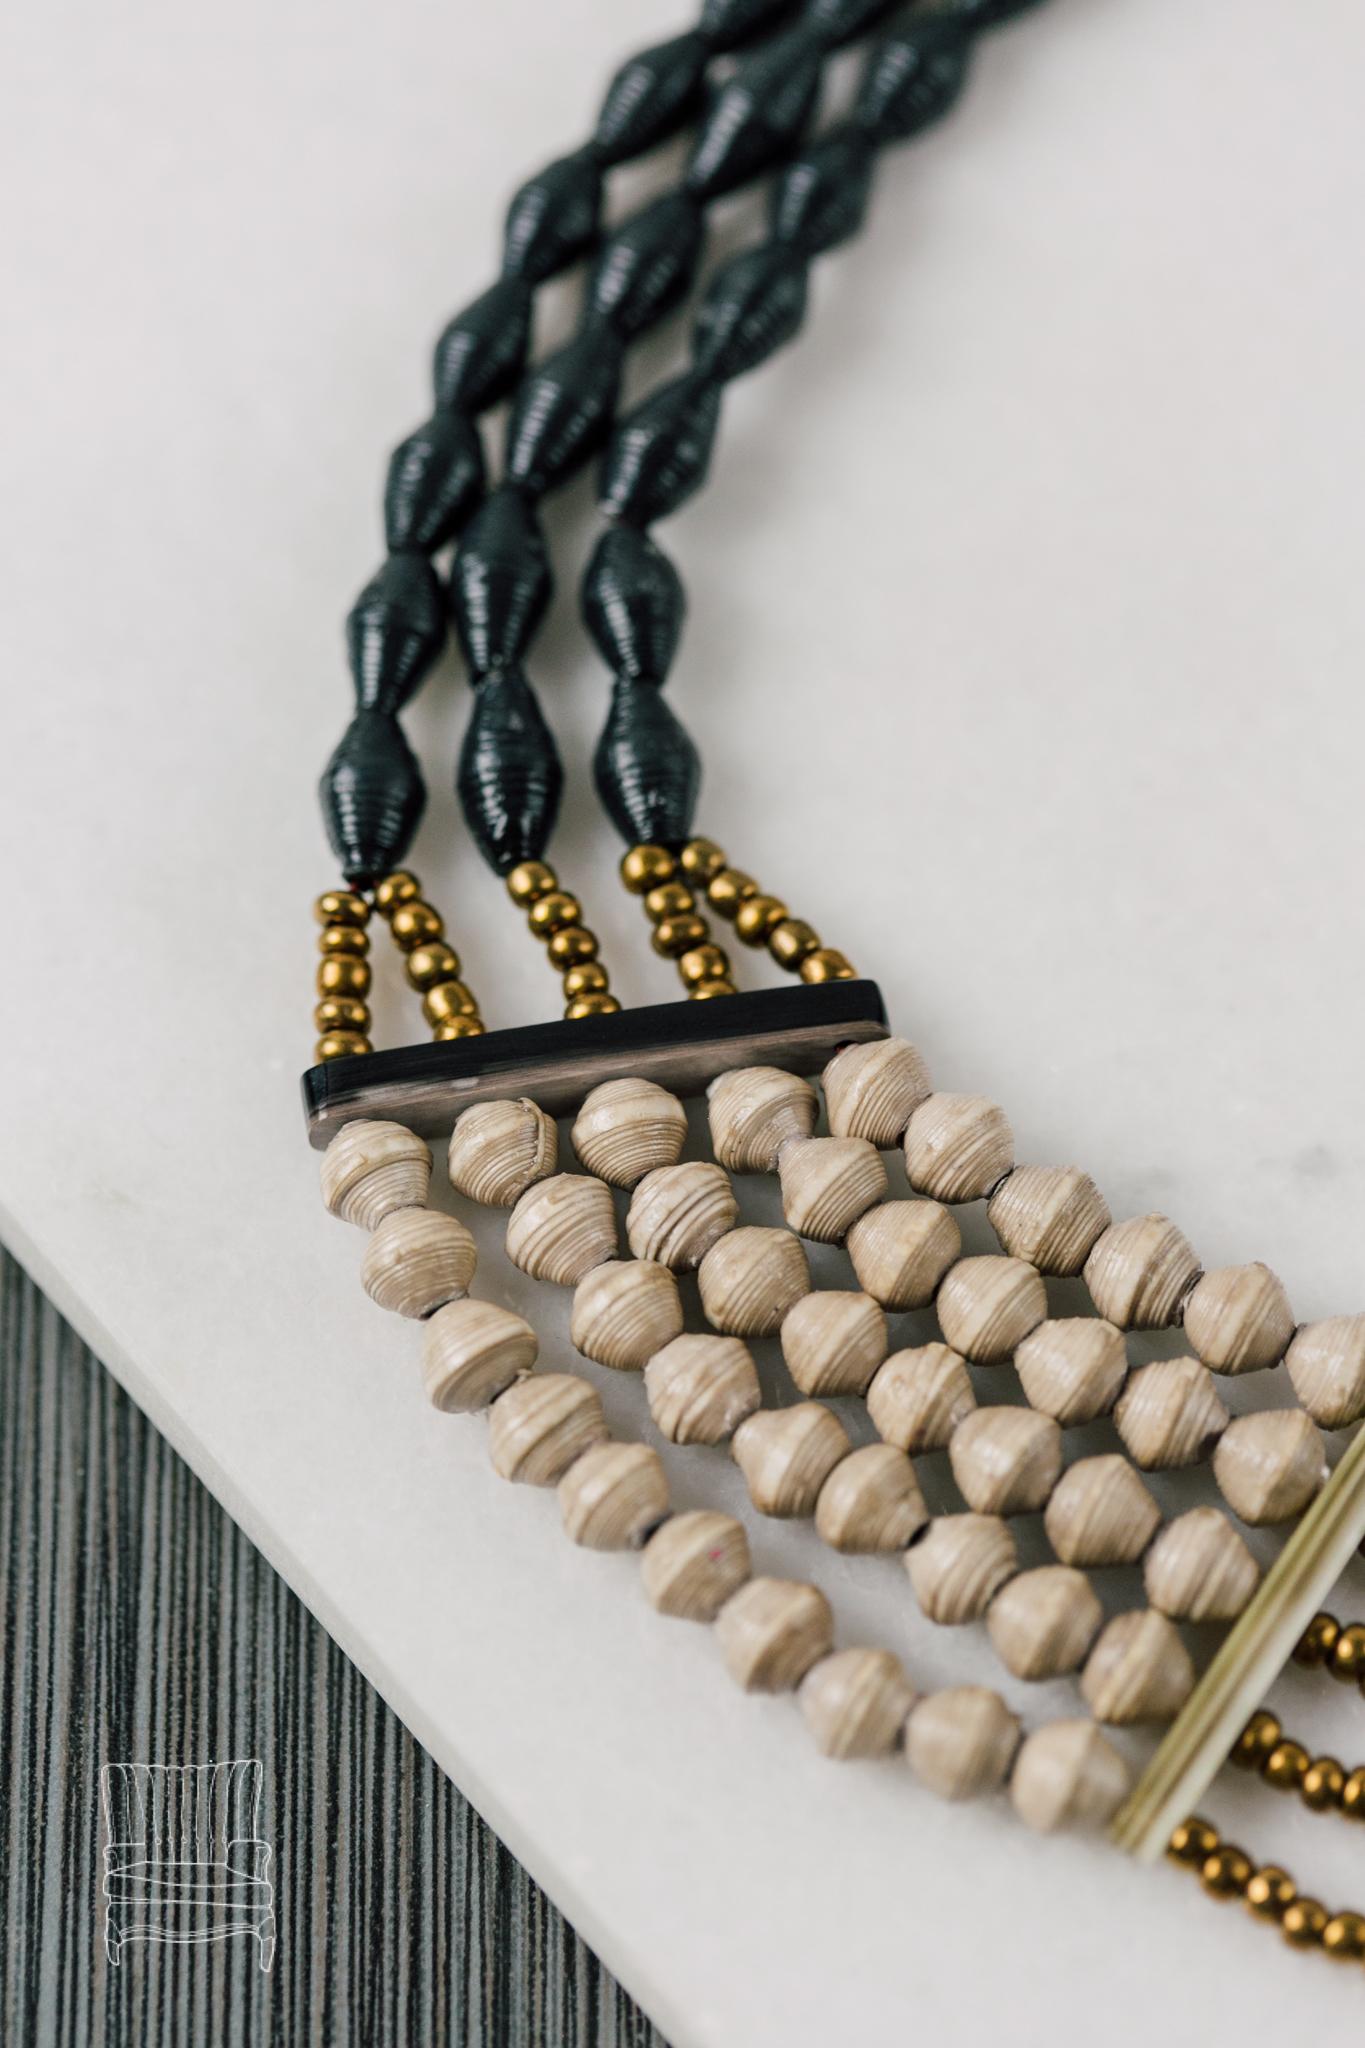 ajuna-jewelry-marketing-photographer-katheryn-moran-fall-2017-17.jpg